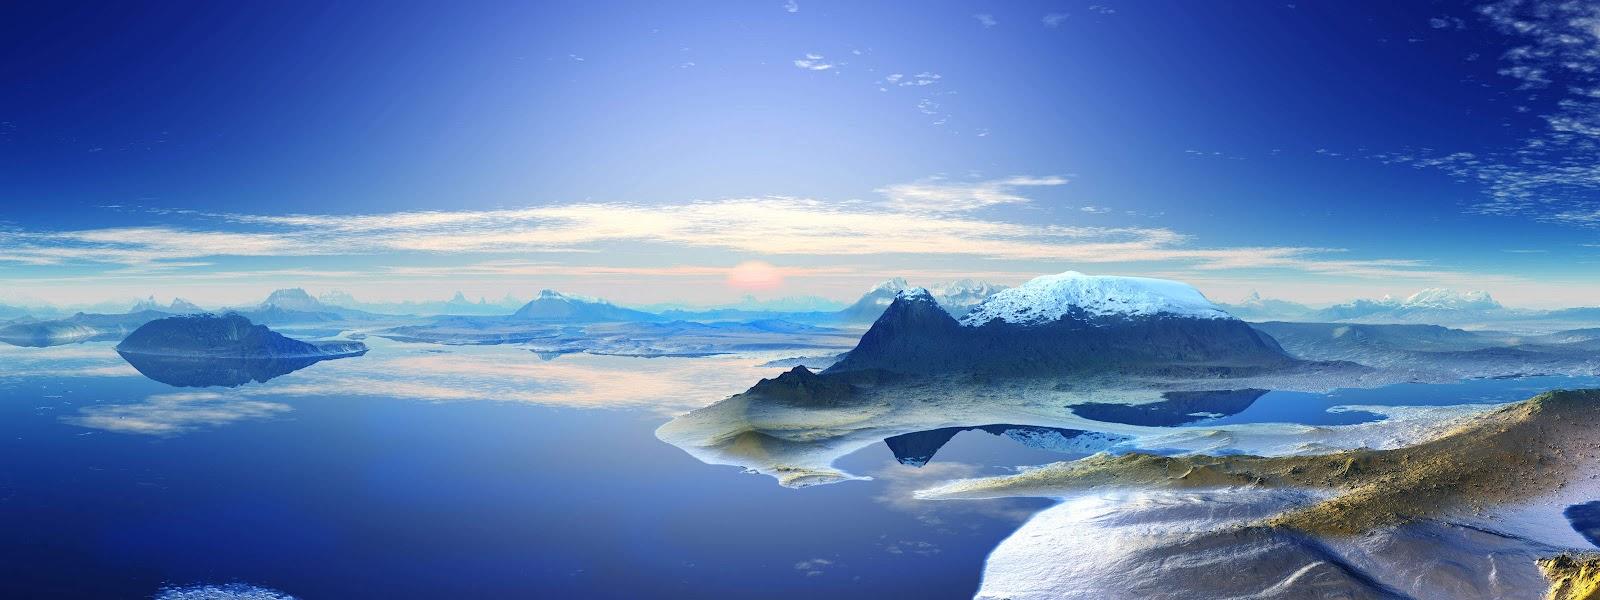 Best Panoramic Landscape Wallpapers | Dual Computer Desktop Wallpapers